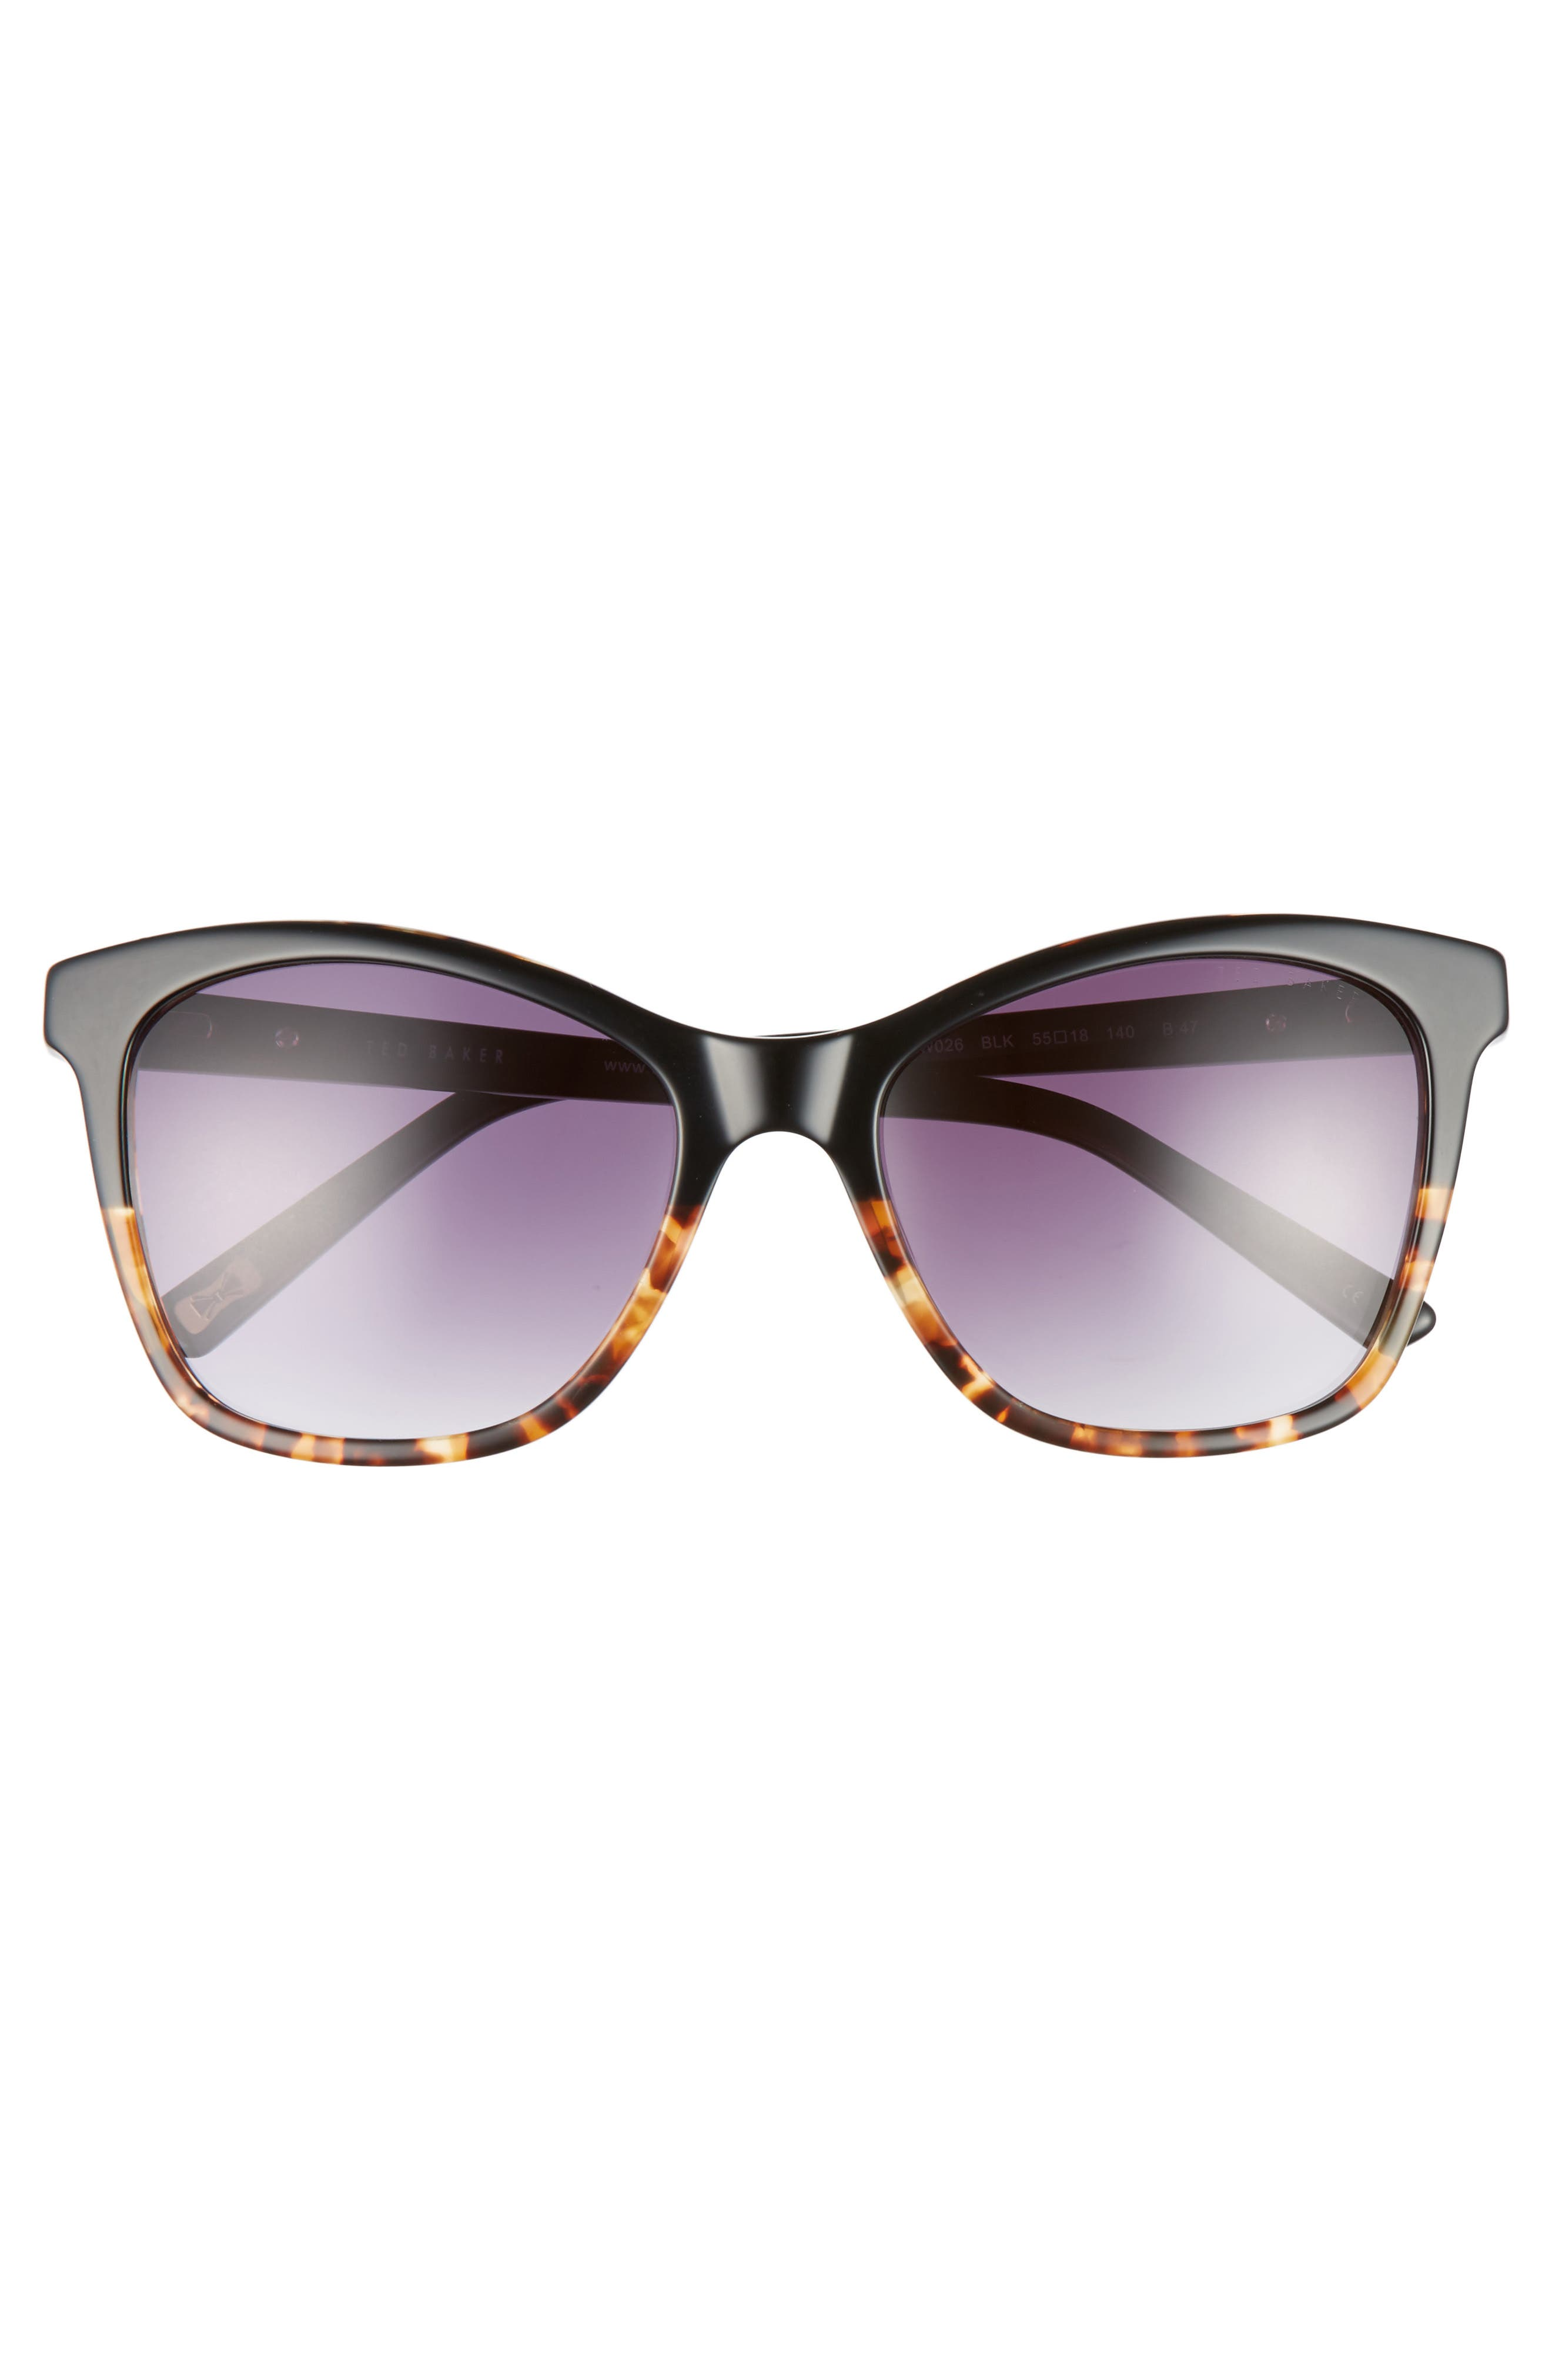 55mm Cat Eye Sunglasses,                             Alternate thumbnail 5, color,